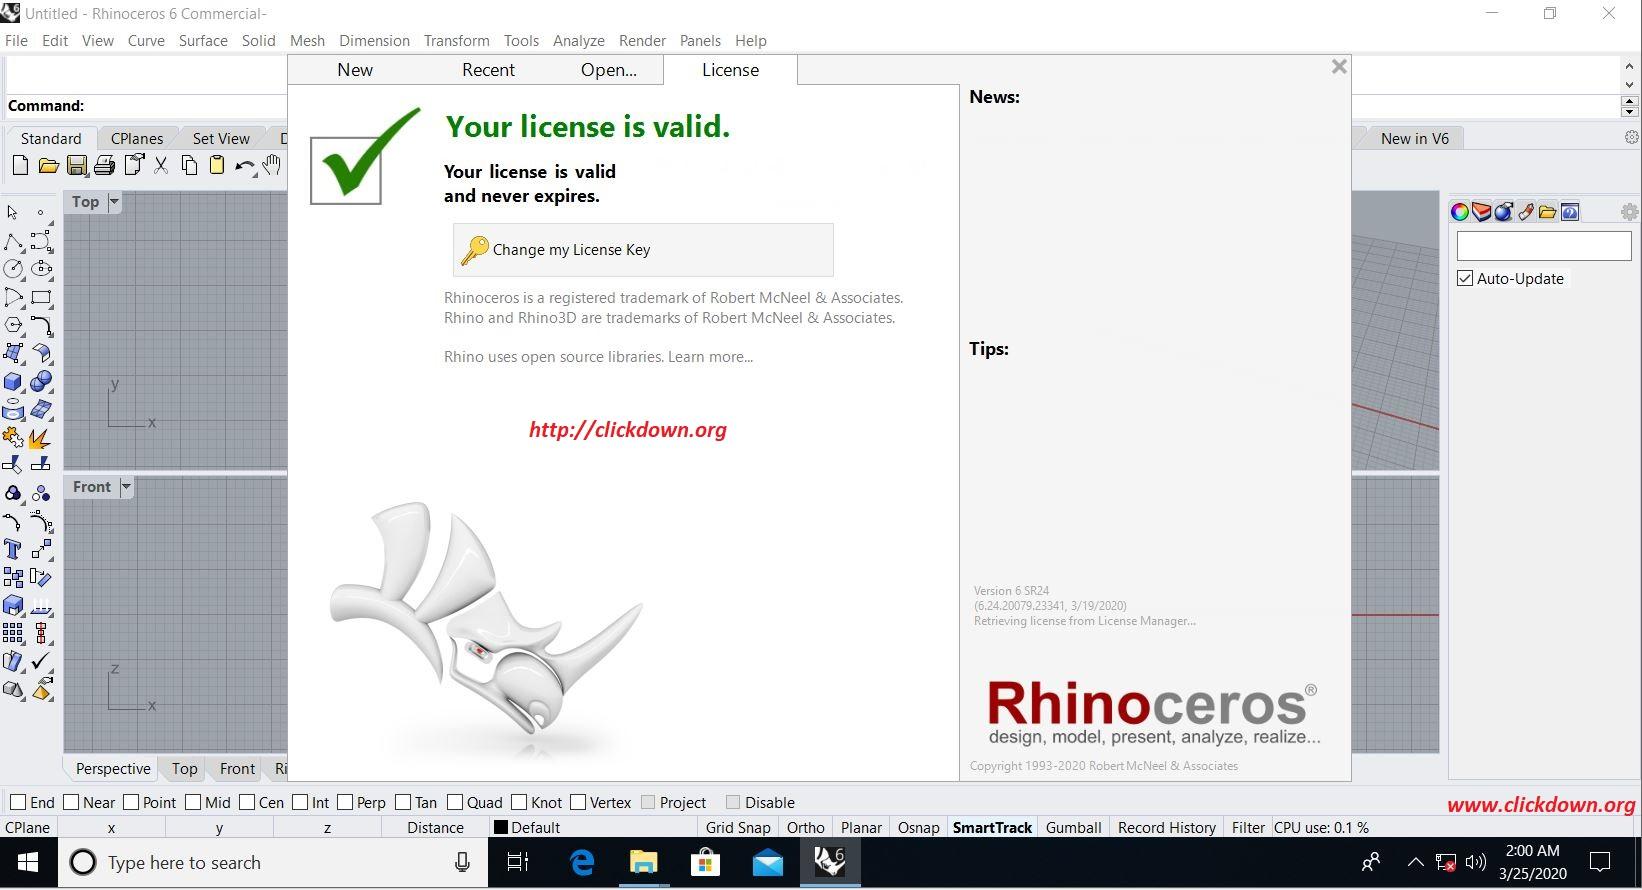 Design with Rhinoceros 6.24 x64 full license